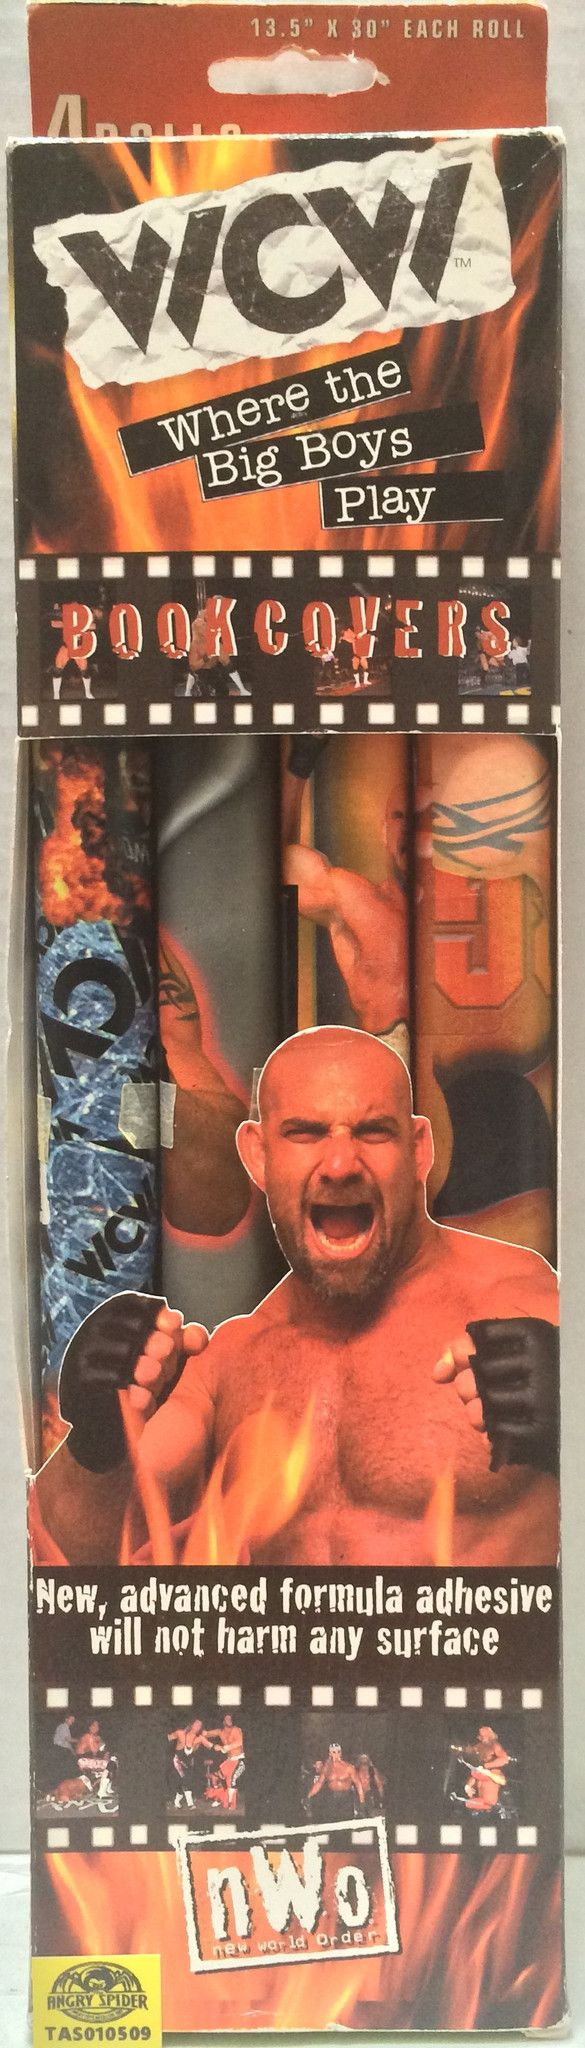 (TAS010509) - 1999 WCW Wrestling Book Covers - Goldberg